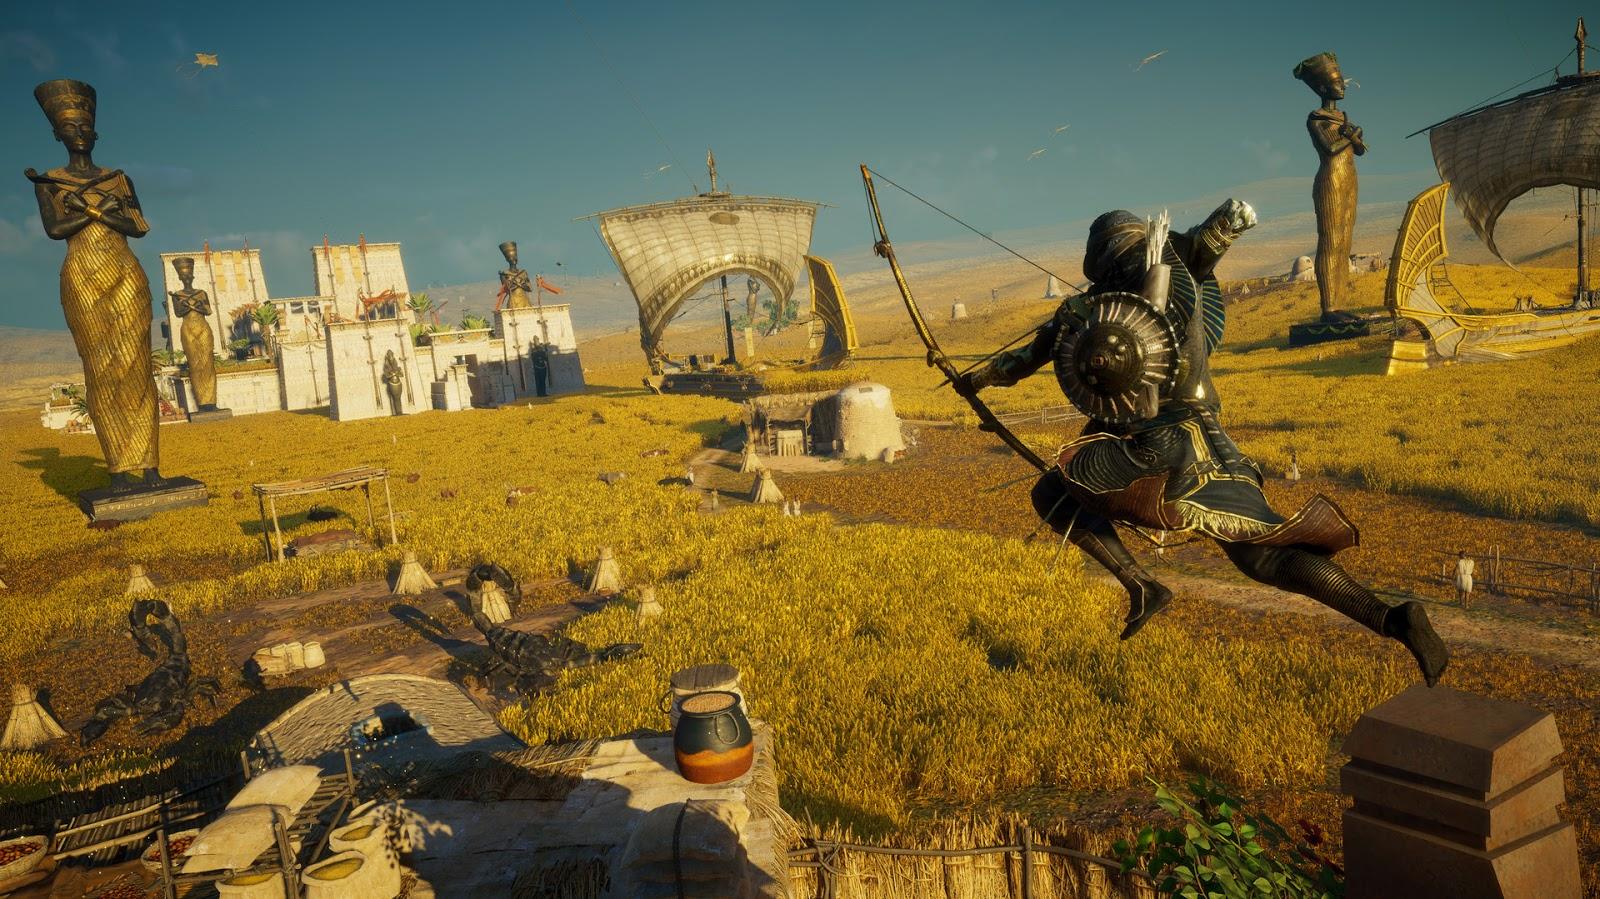 Assassin's Creed Origins The Curse Of The Pharaohs PC ESPAÑOL + Crackfix (CODEX) + REPACK 11 DVD5 (JPW) 3